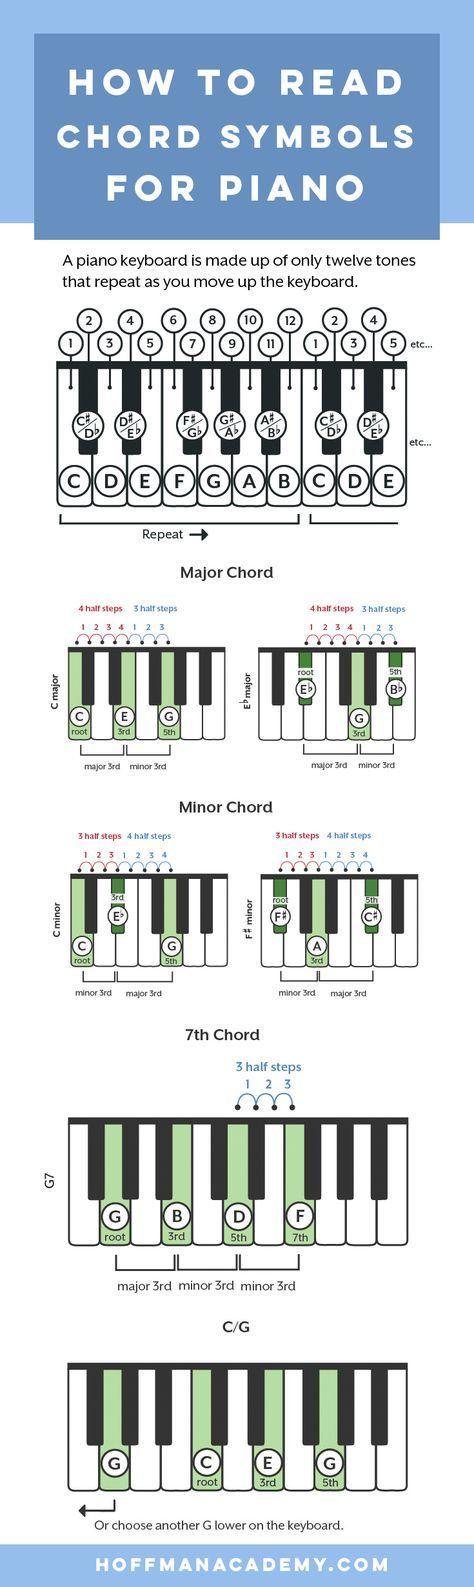 Handy Laminated Chord Chart For Piano  Chart Pianos And Students